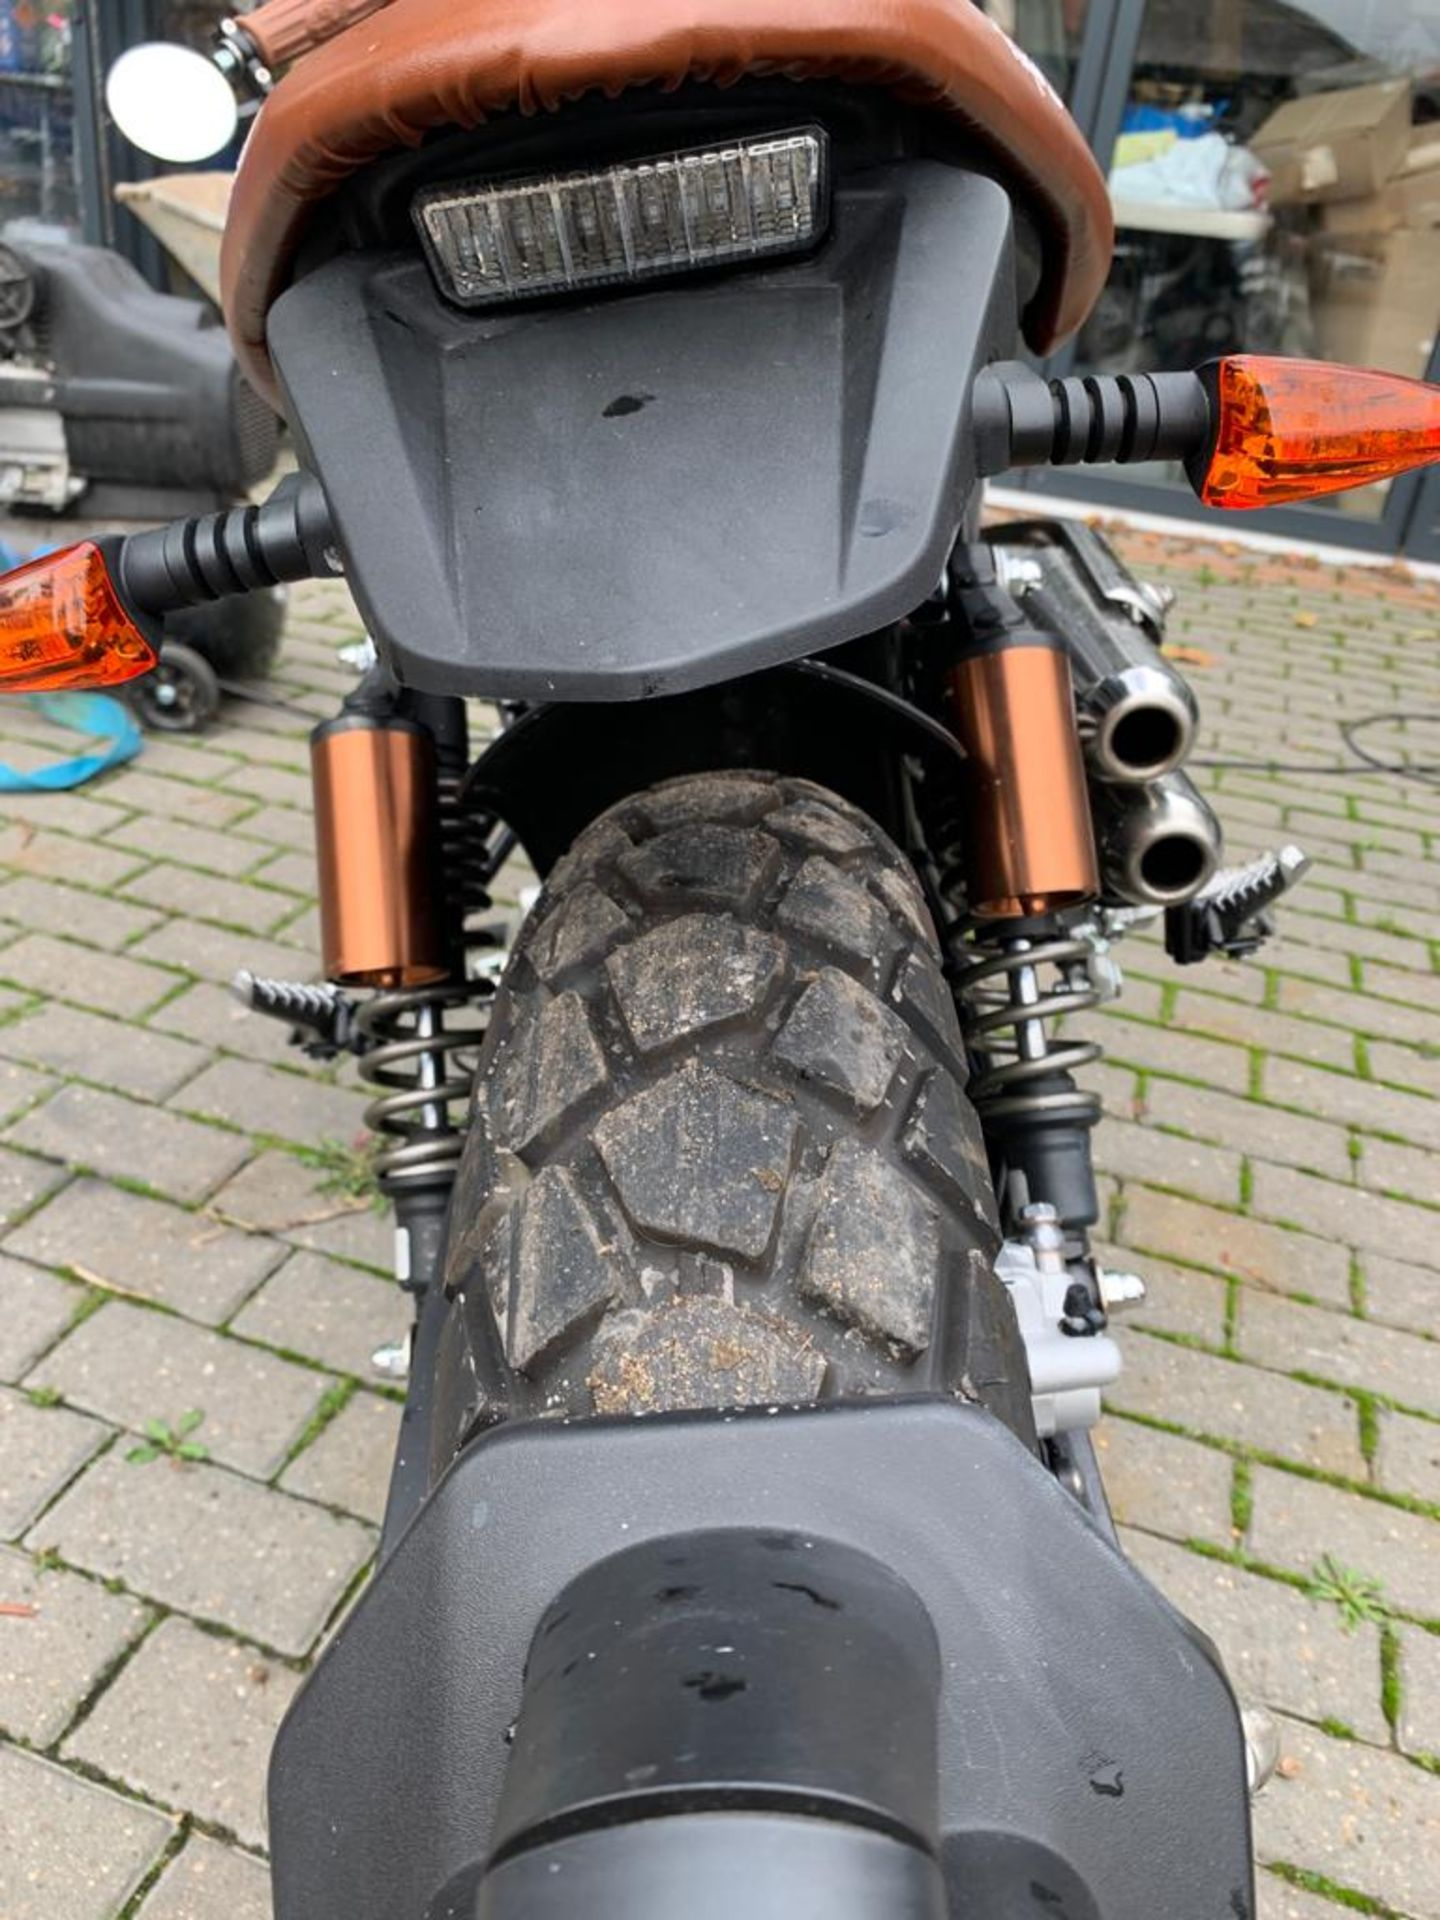 2018/18 REG MONDIAL HPS 125 S E4 SCRAMBLER MOTORBIKE / MOTORCYCLE, ROAD REGISTERED WITH V5 PRESENT - Image 4 of 11